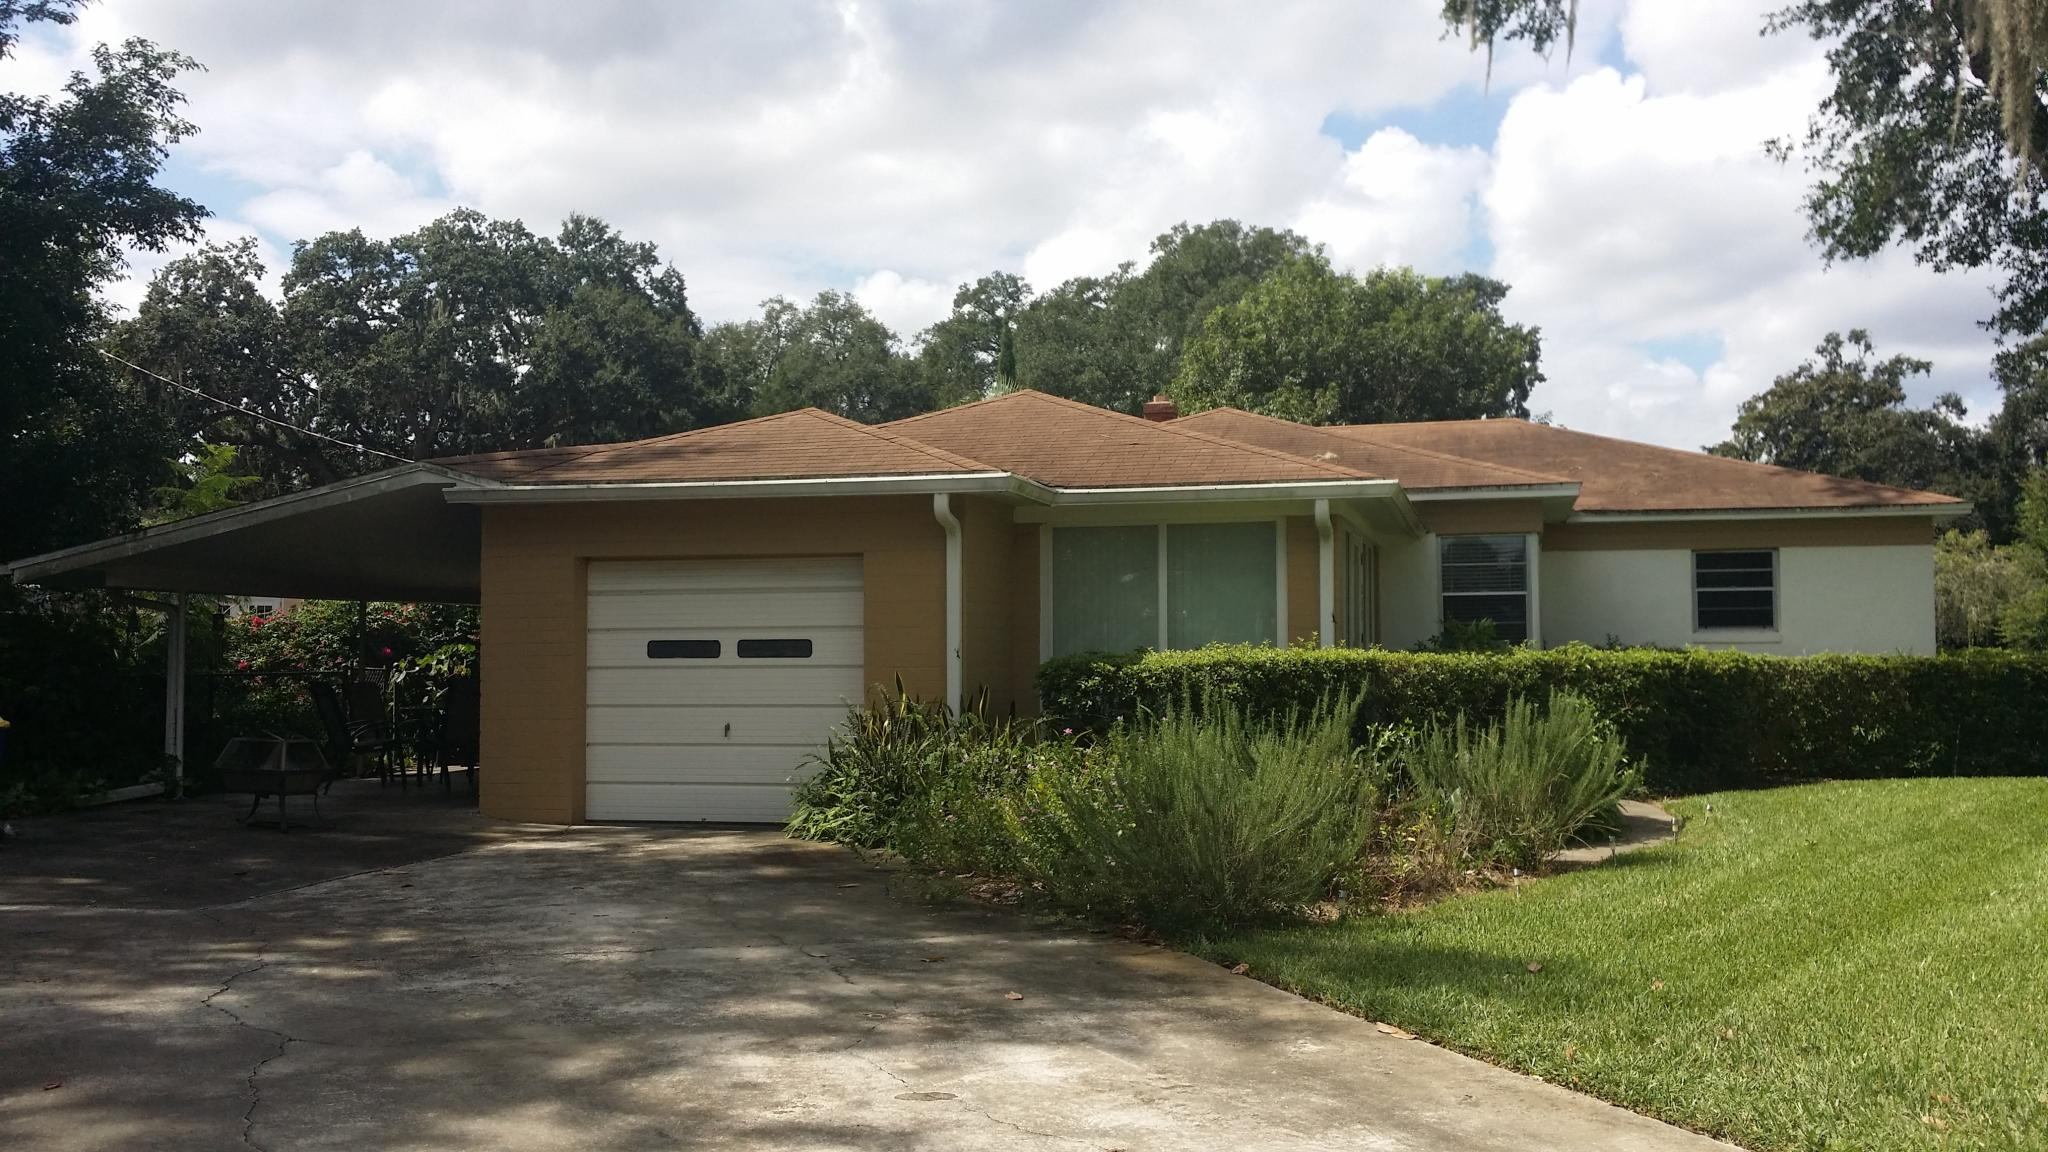 247 N Boyd St For Rent - Winter Garden, FL | Trulia